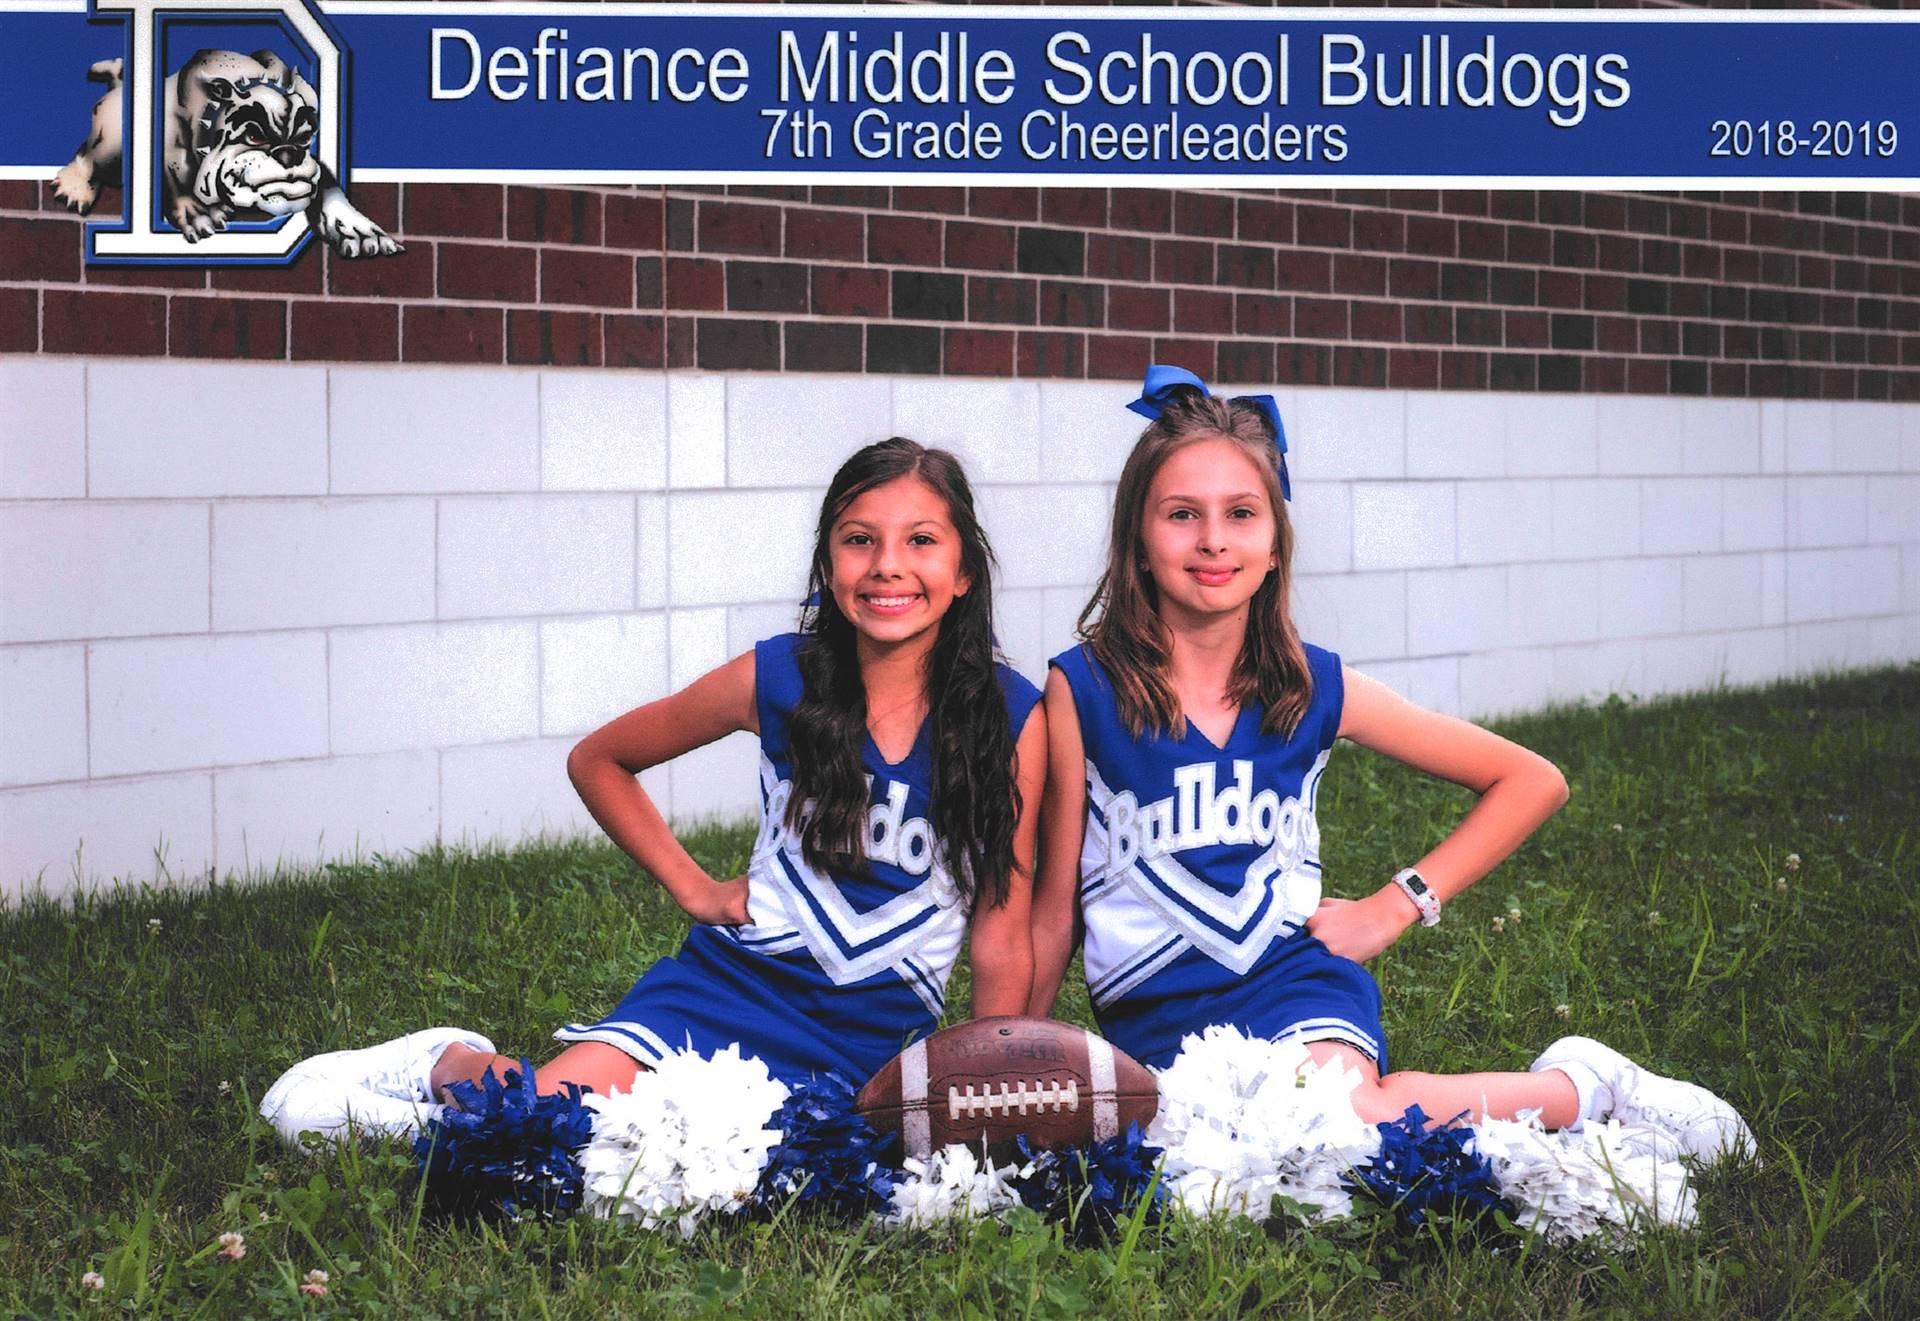 7th Grade Cheerleaders-Fall 2018